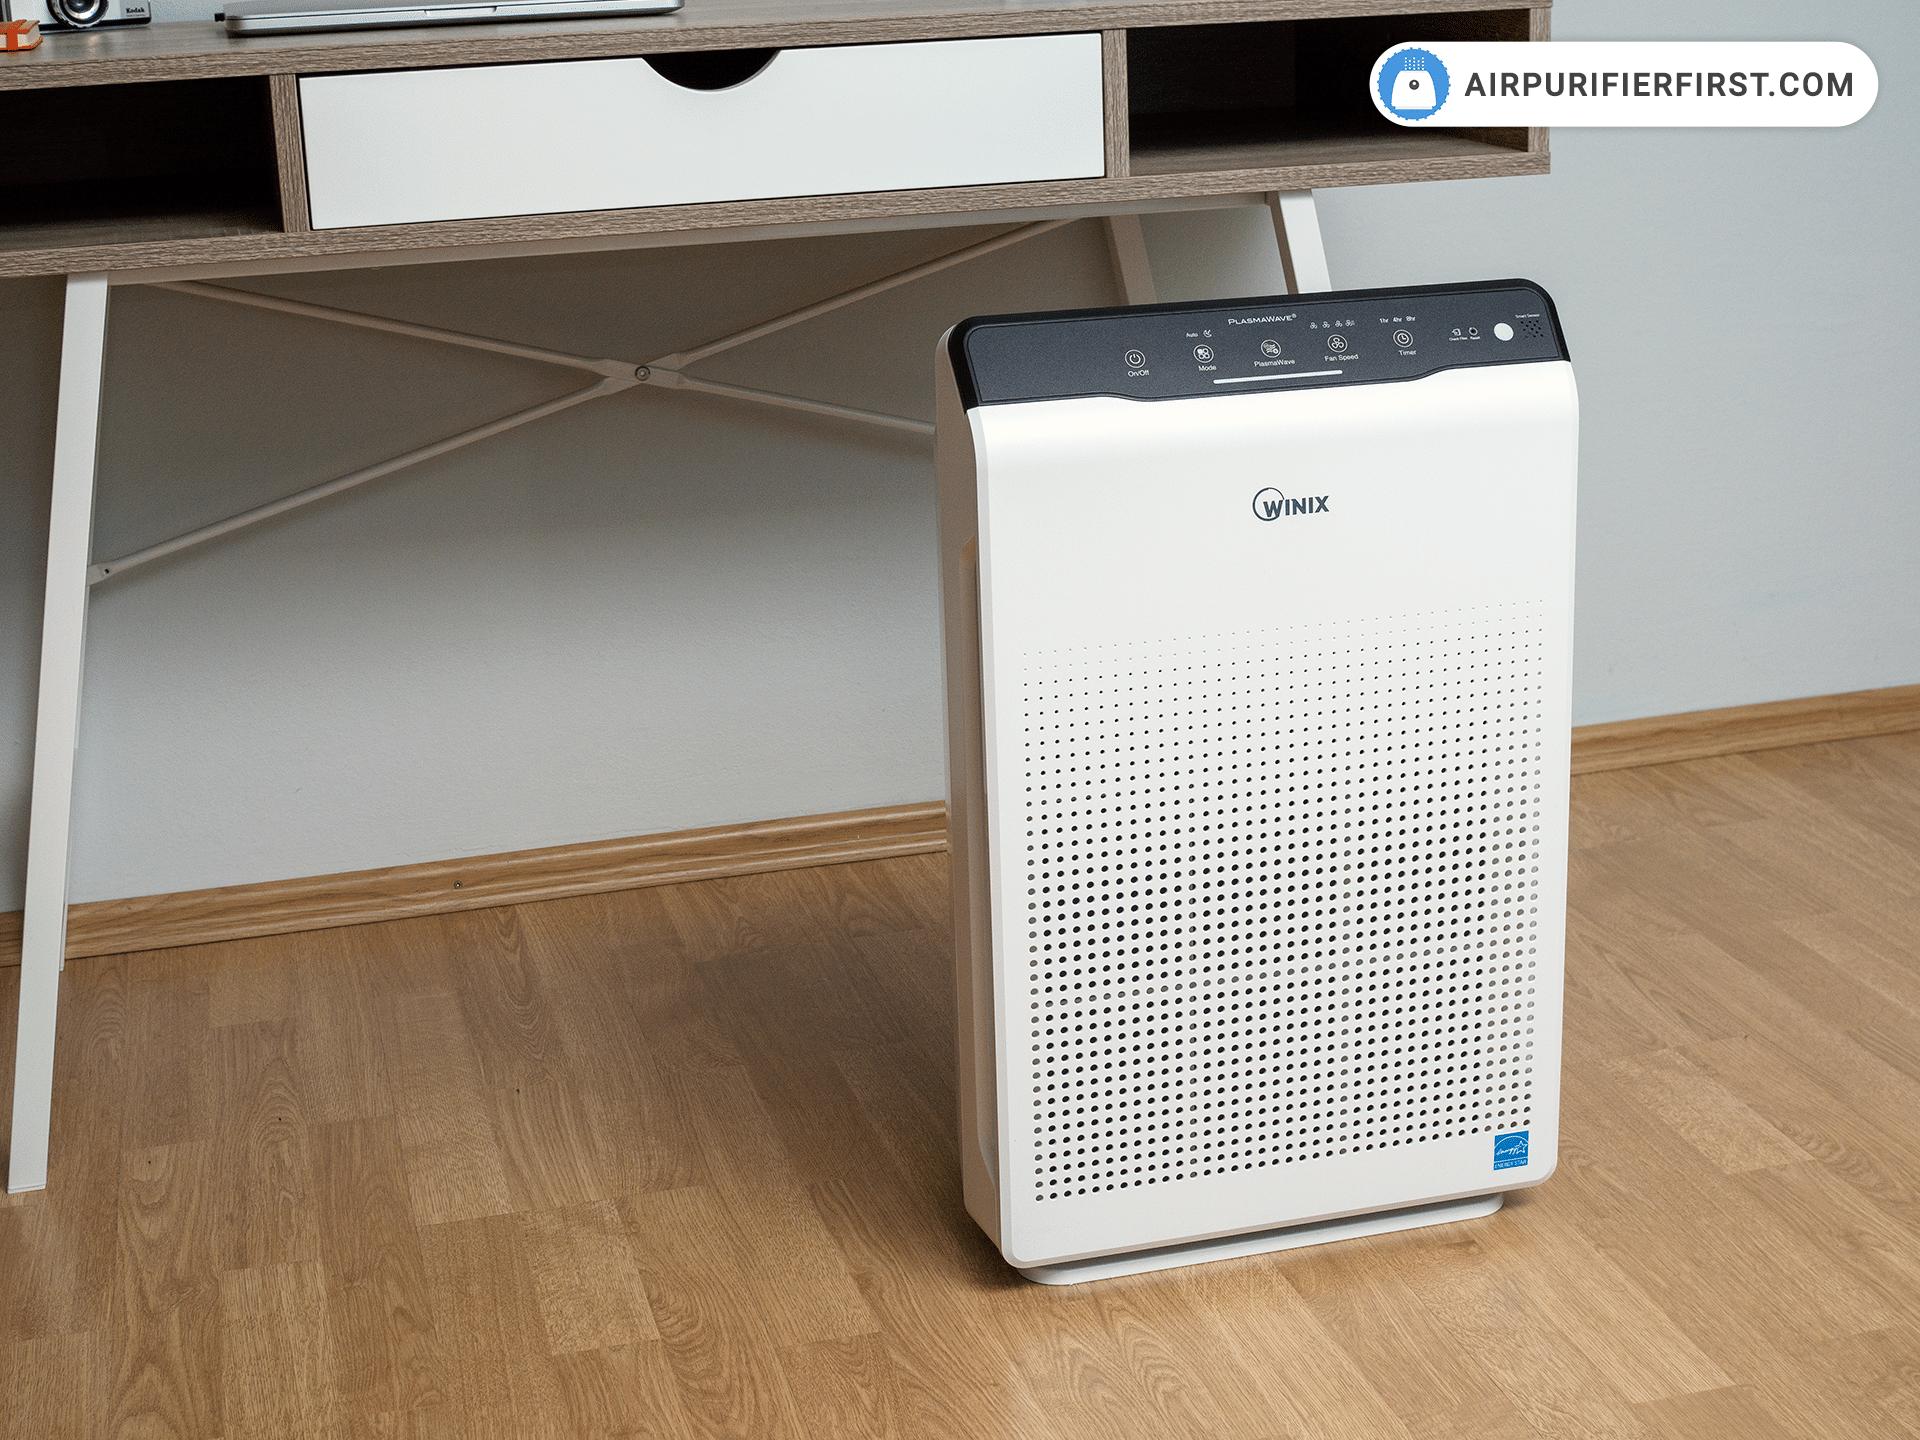 Winix C535 Air Purifier - Review